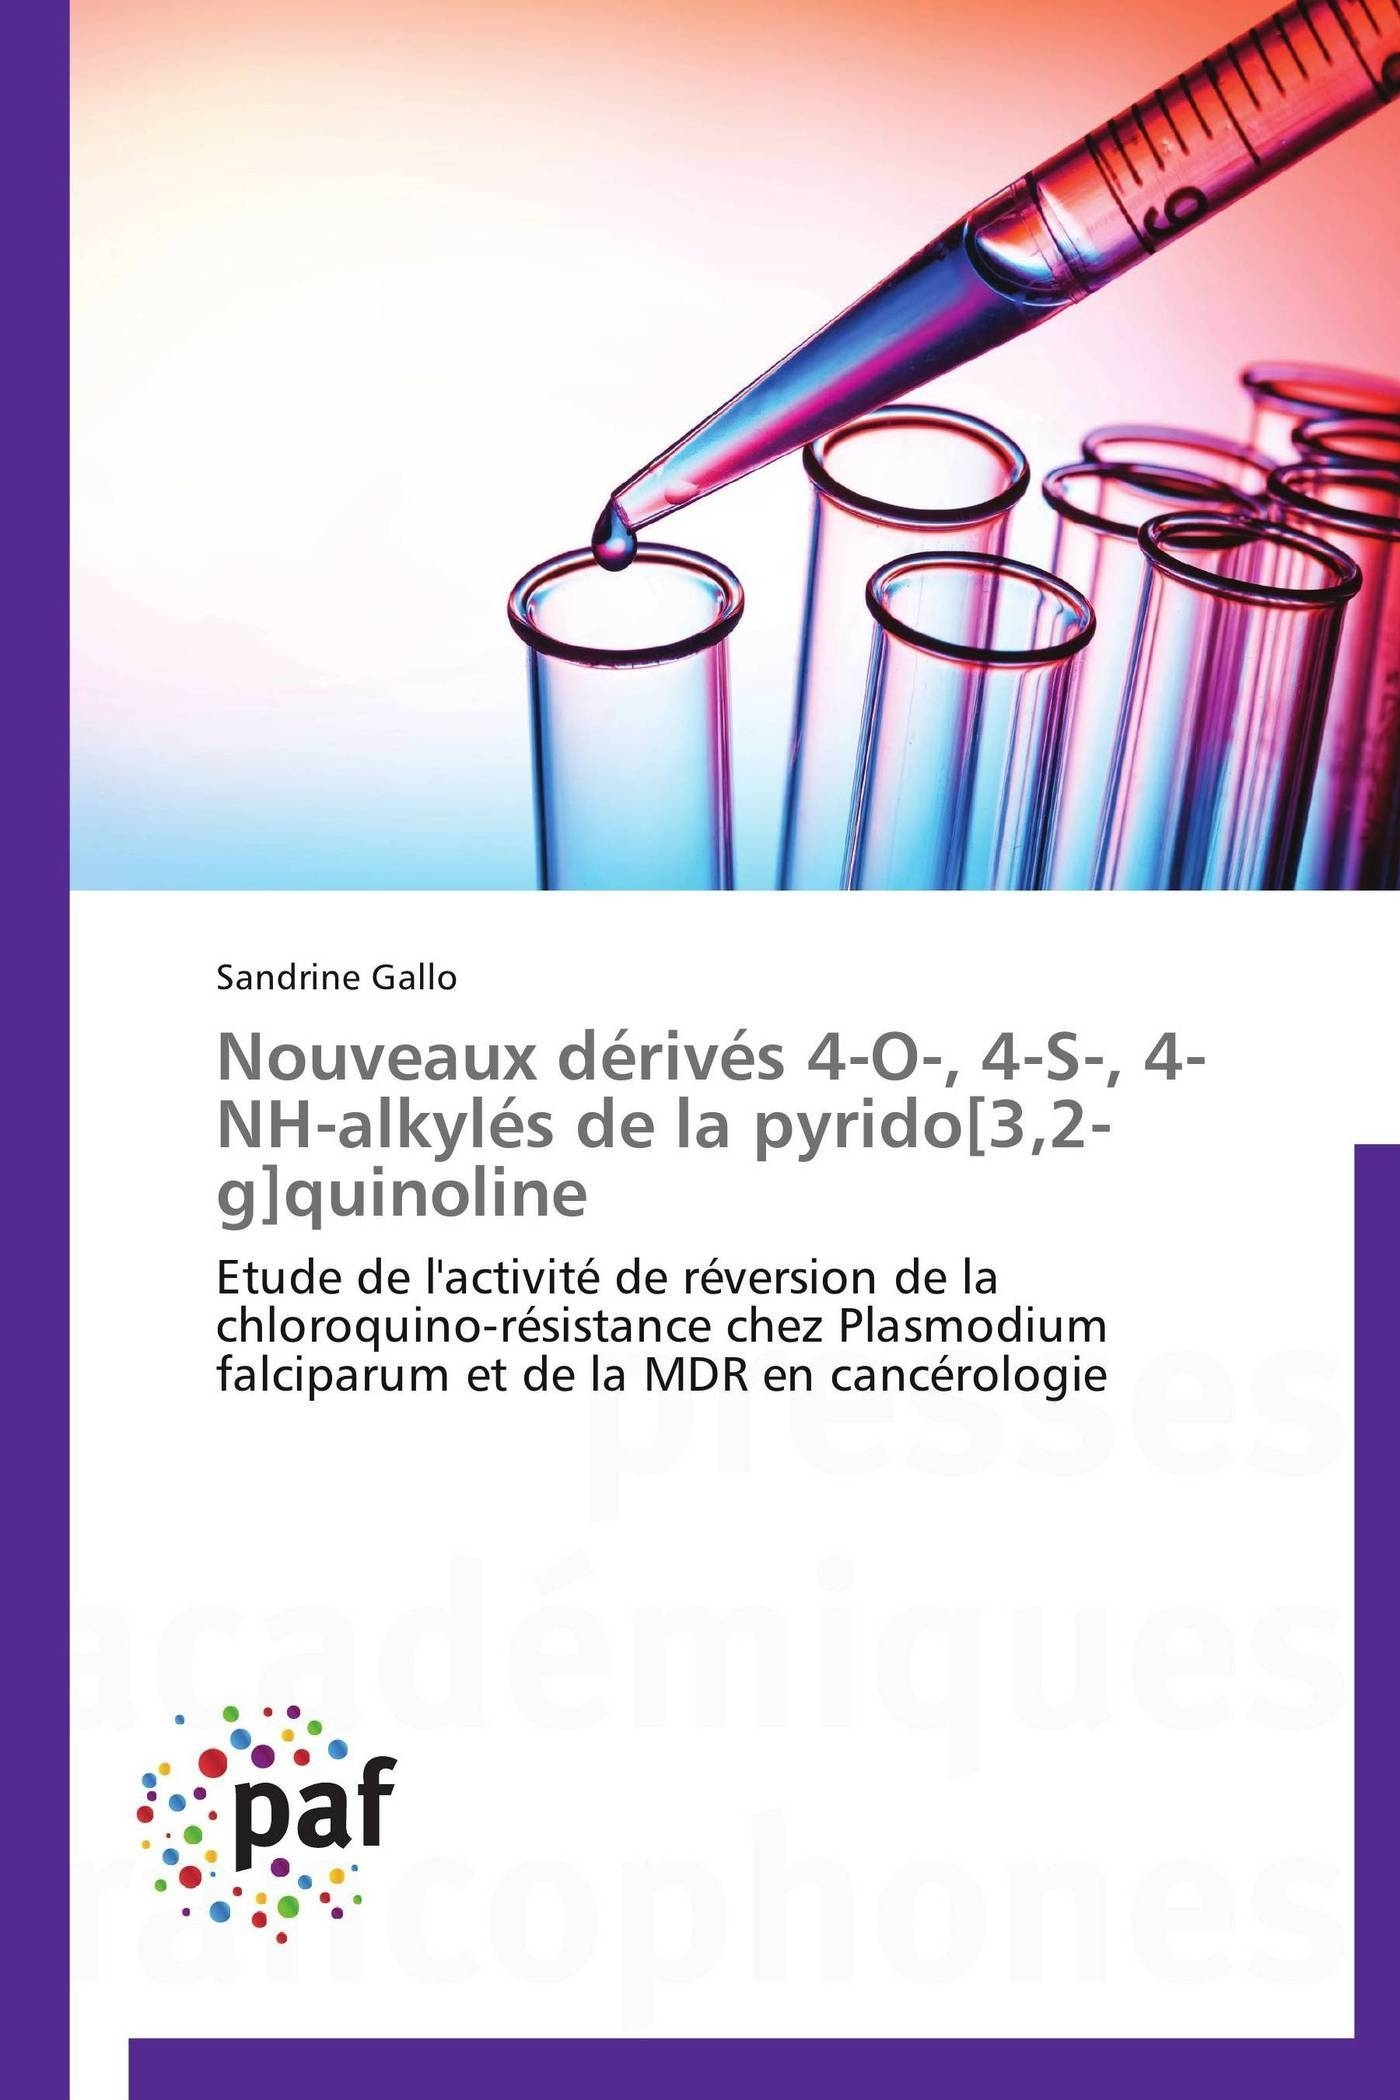 NOUVEAUX DERIVES 4-O-, 4-S-, 4-NH-ALKYLES DE LA PYRIDO[3,2-G]QUINOLINE